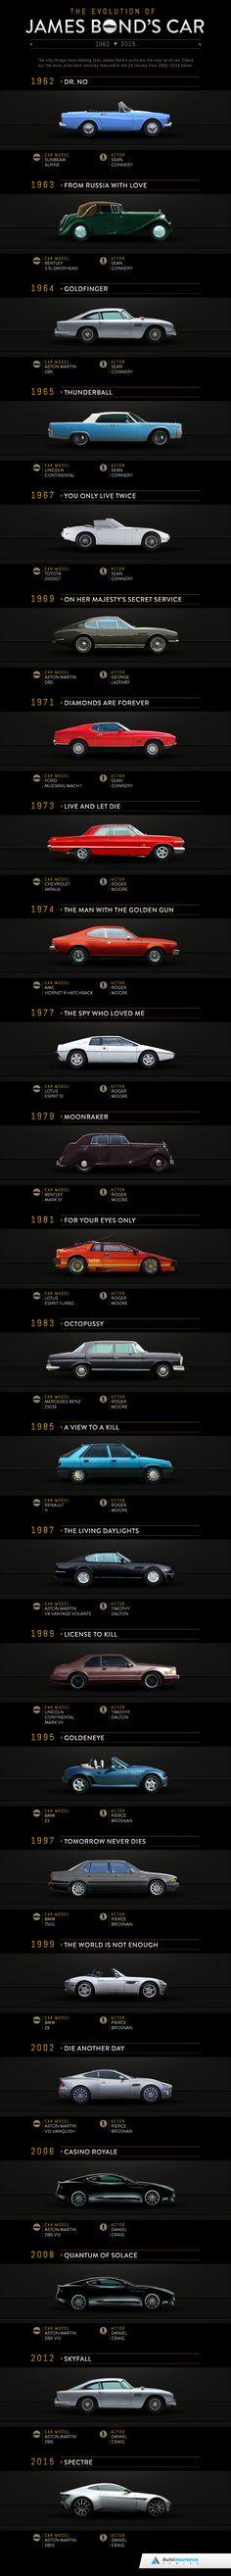 , The Evolution of James Bond's Car! , The Evolution of James Bond's Car! James Bond Auto, James Bond Movies, Estilo James Bond, Mustang, Automobile, Aston Martin Lagonda, Bond Girls, S Car, Amazing Cars